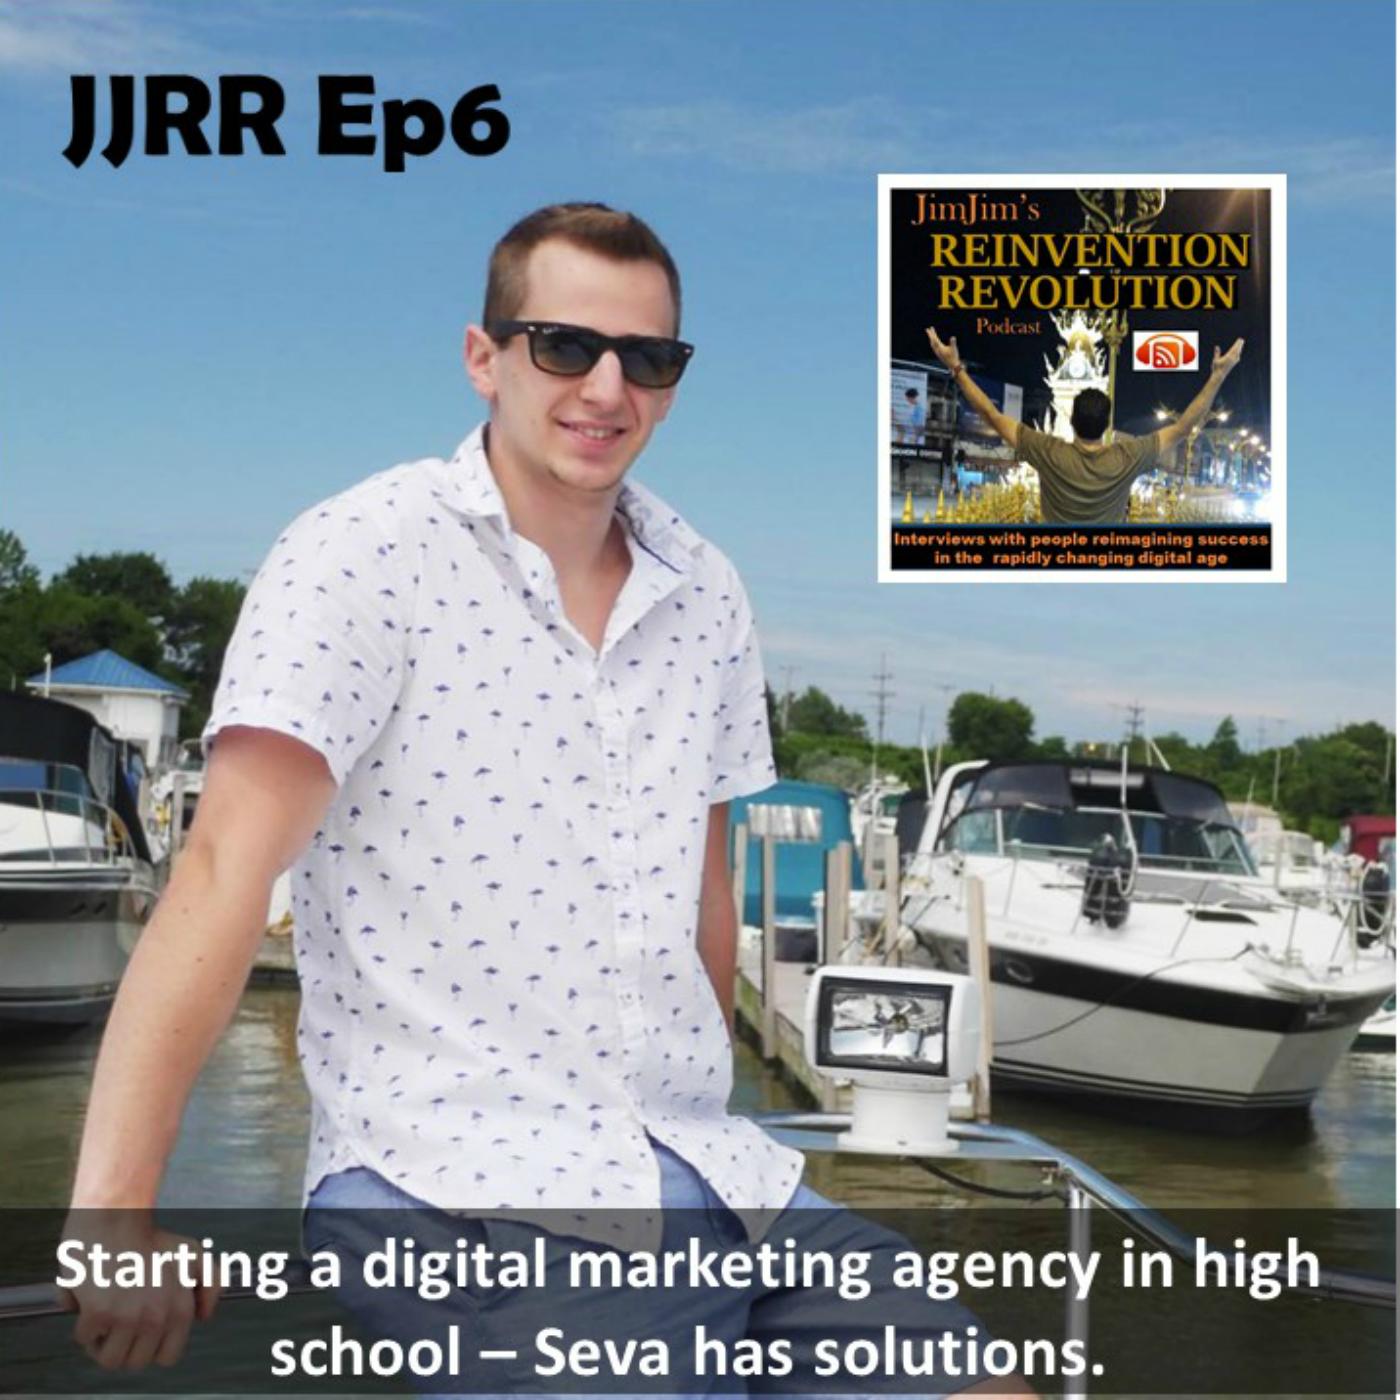 JJRR Ep6 Starting a digital marketing agency in high school – Seva has solutions